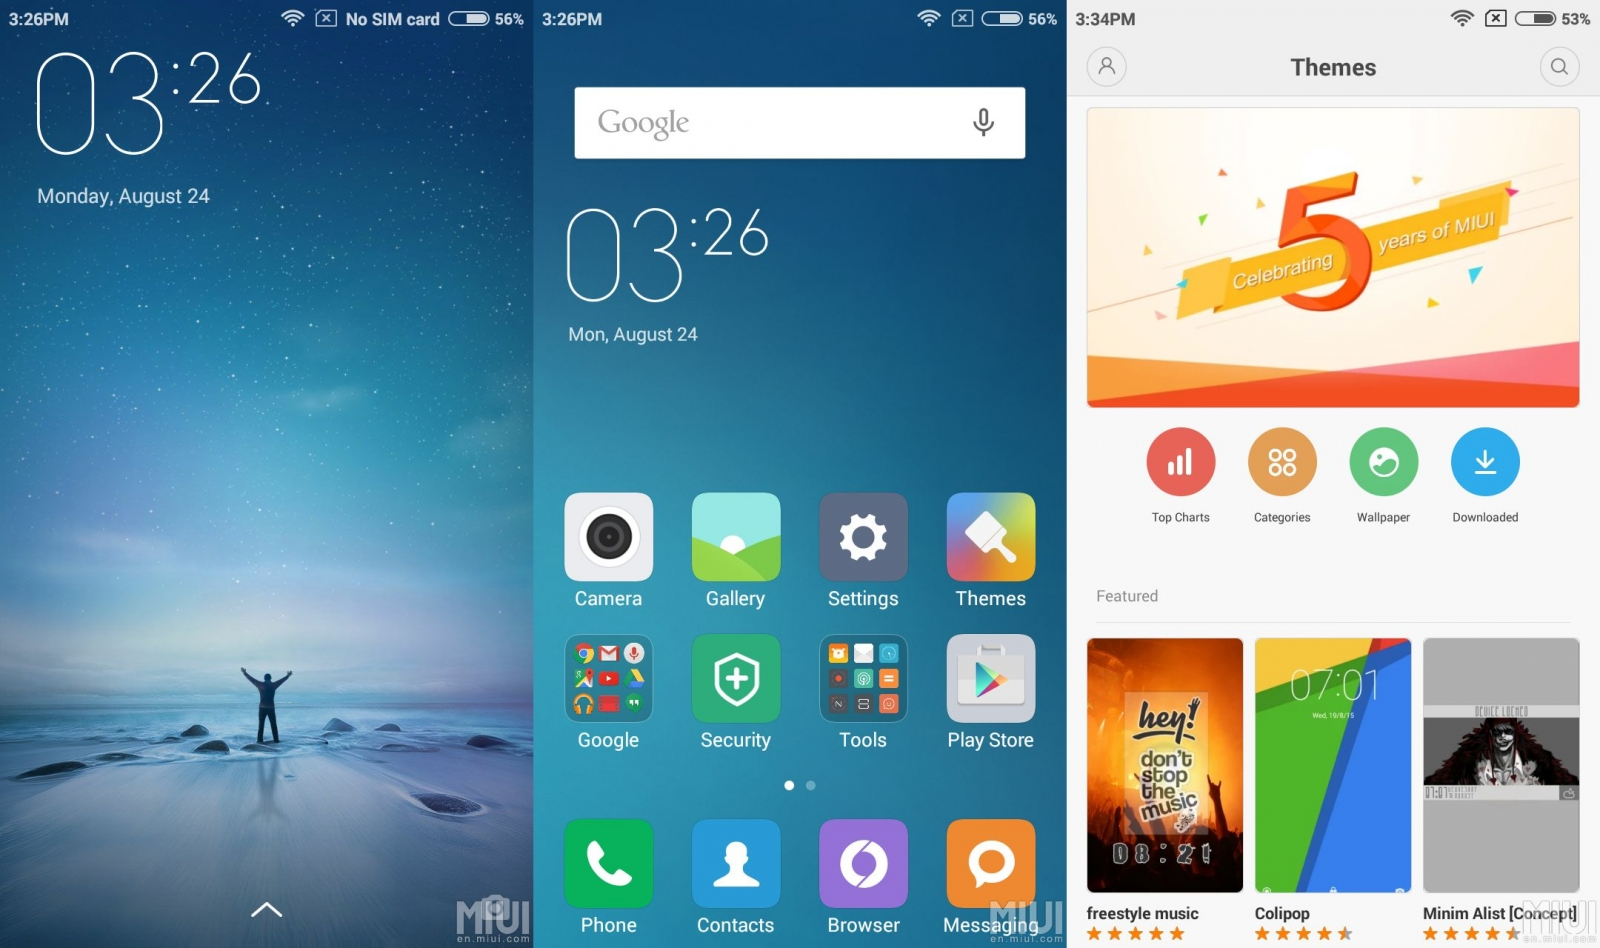 Xiaomi releases MIUI 7 global beta ROM 5.8.22 OTA for a ...